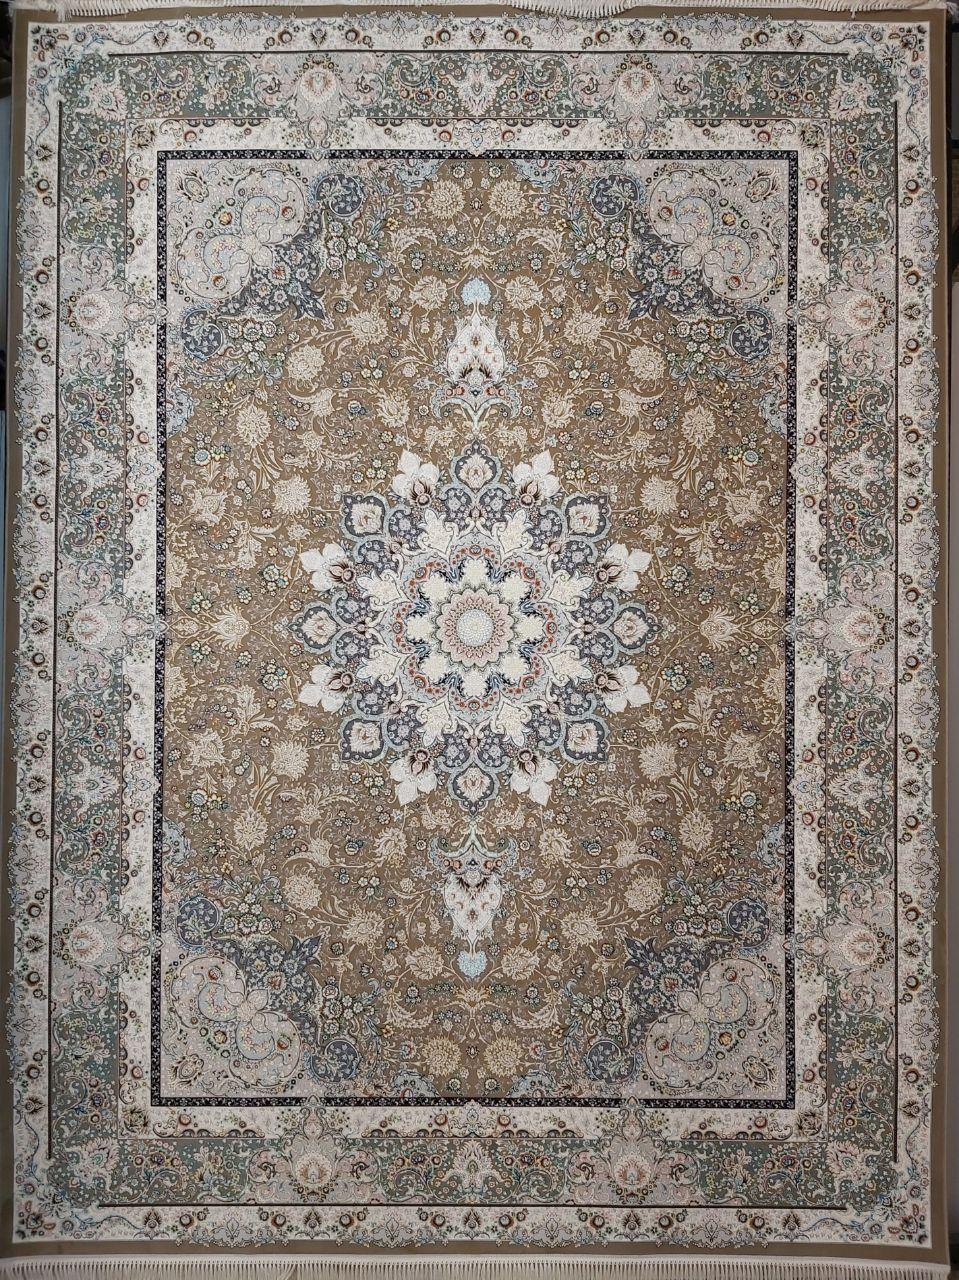 فرش 1200 شانه گل برجسته نقشه سپهر زمینه نسکافه ای